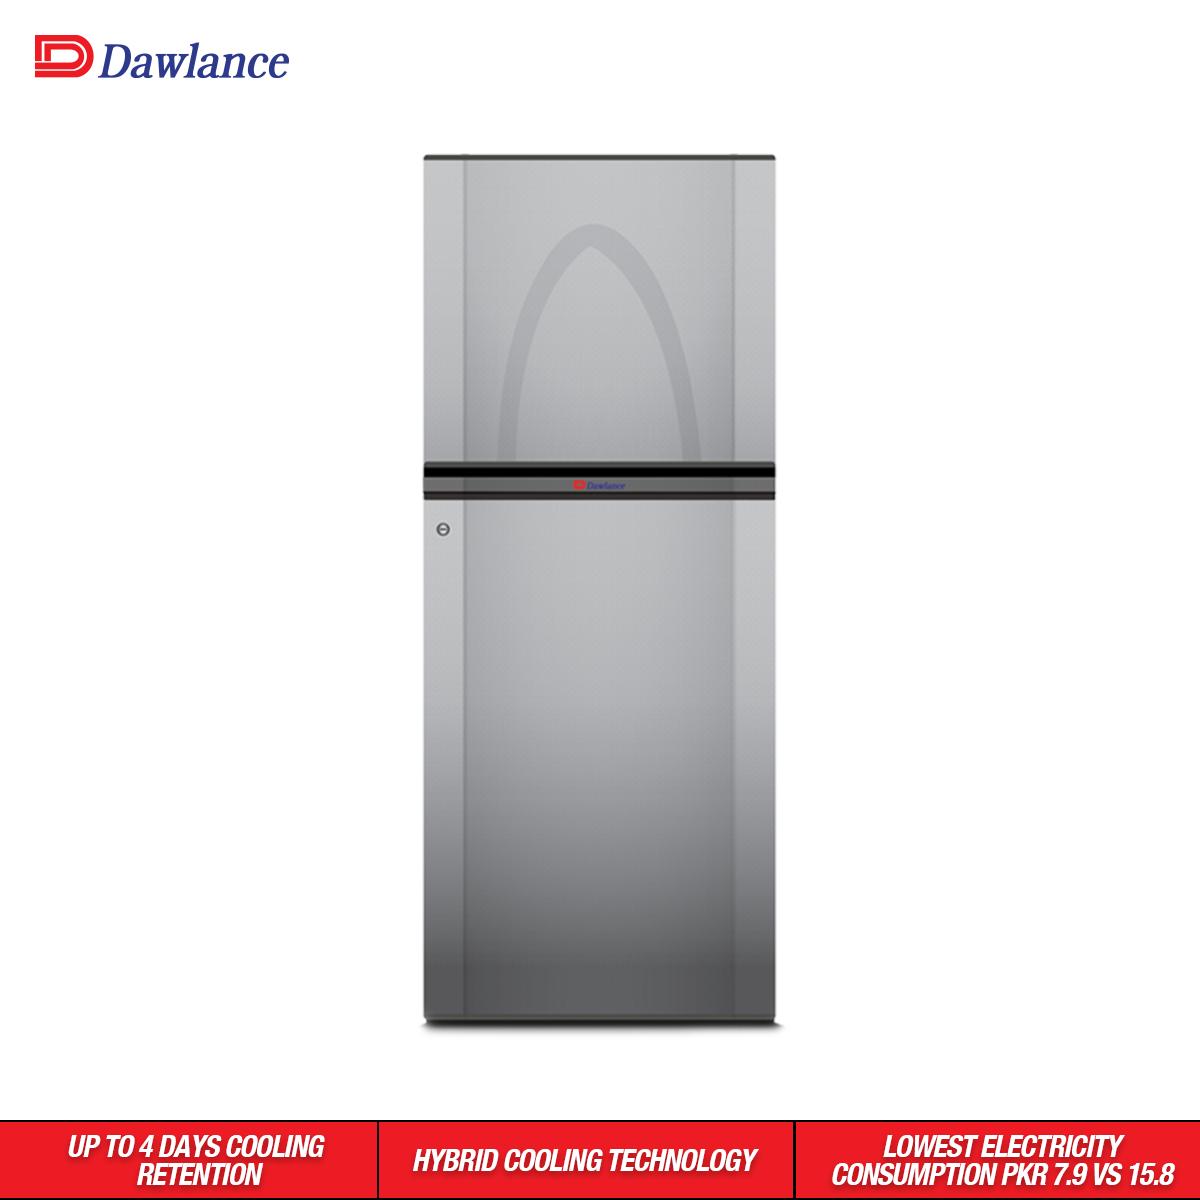 Dawlance Refrigerator 9144 Eds 8 Cft Energy Saving + Hybrid Cooling